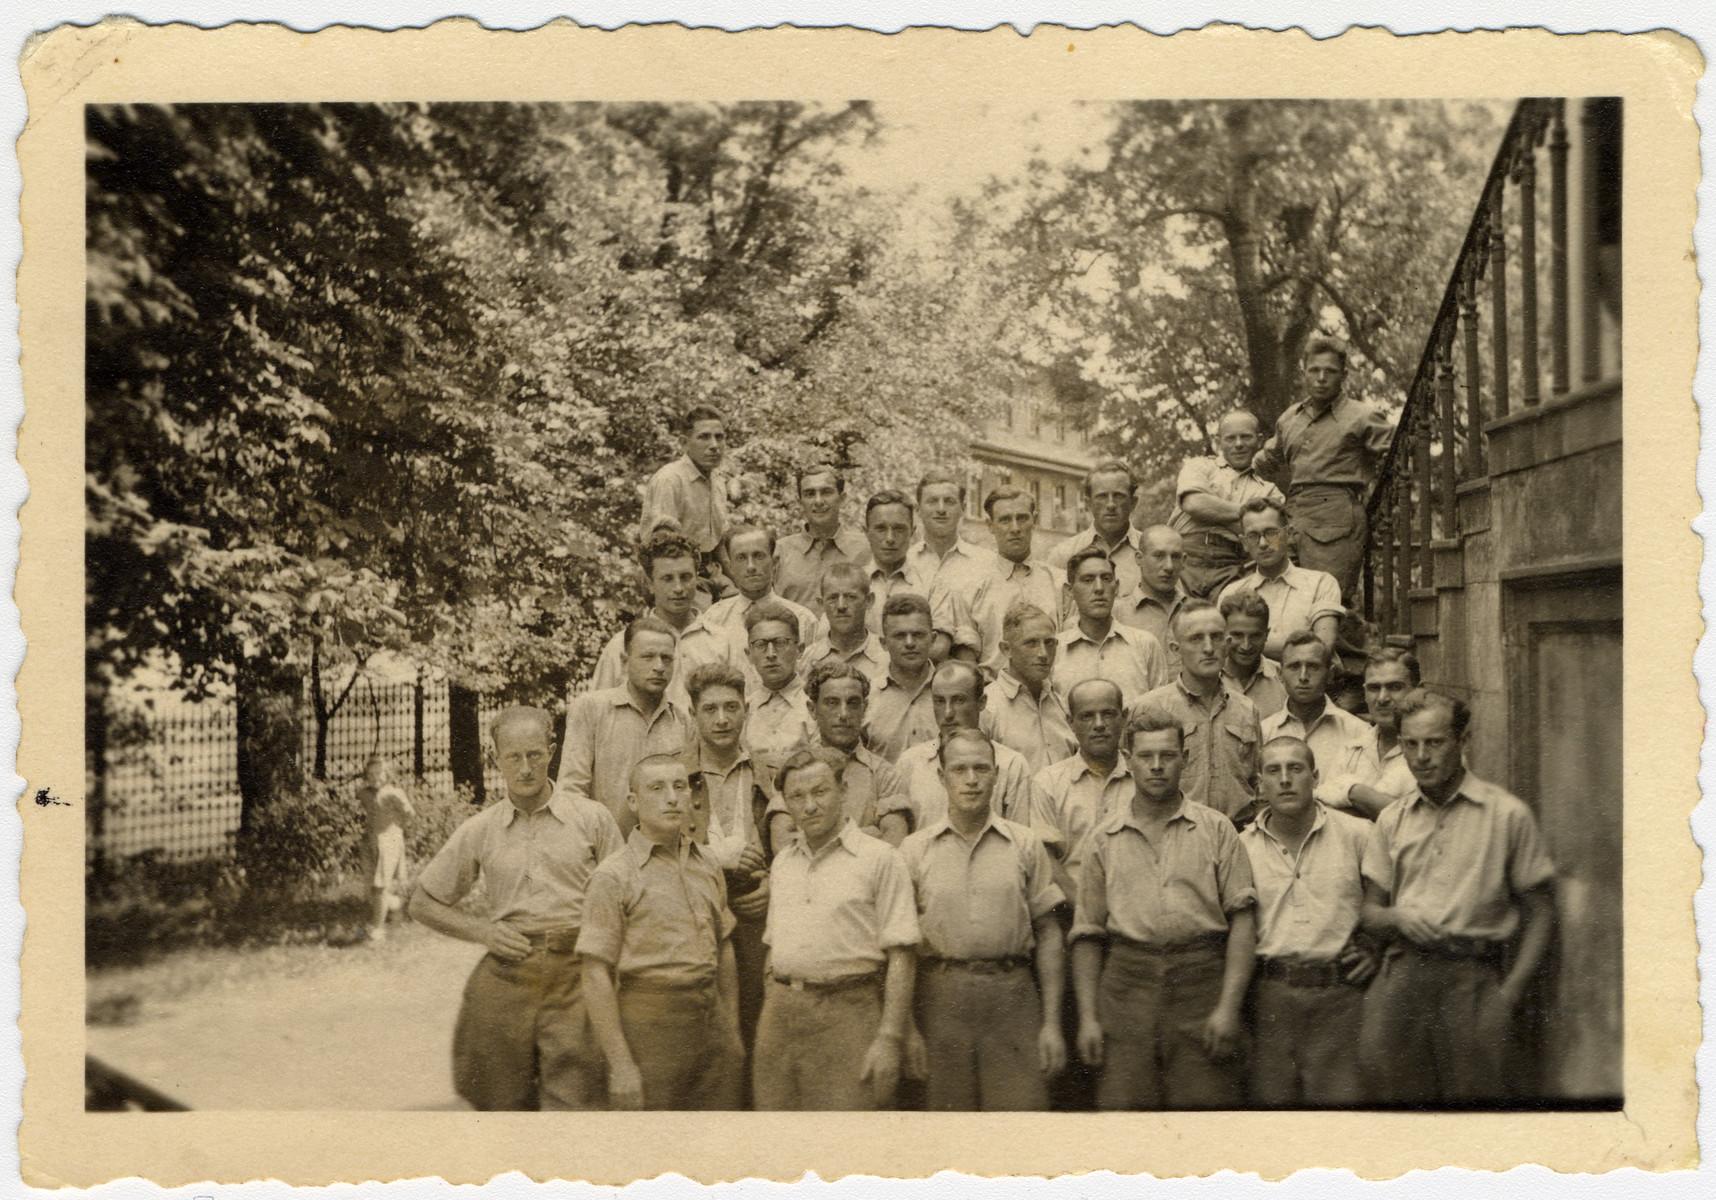 Group portrait of the Arbeistkomando,